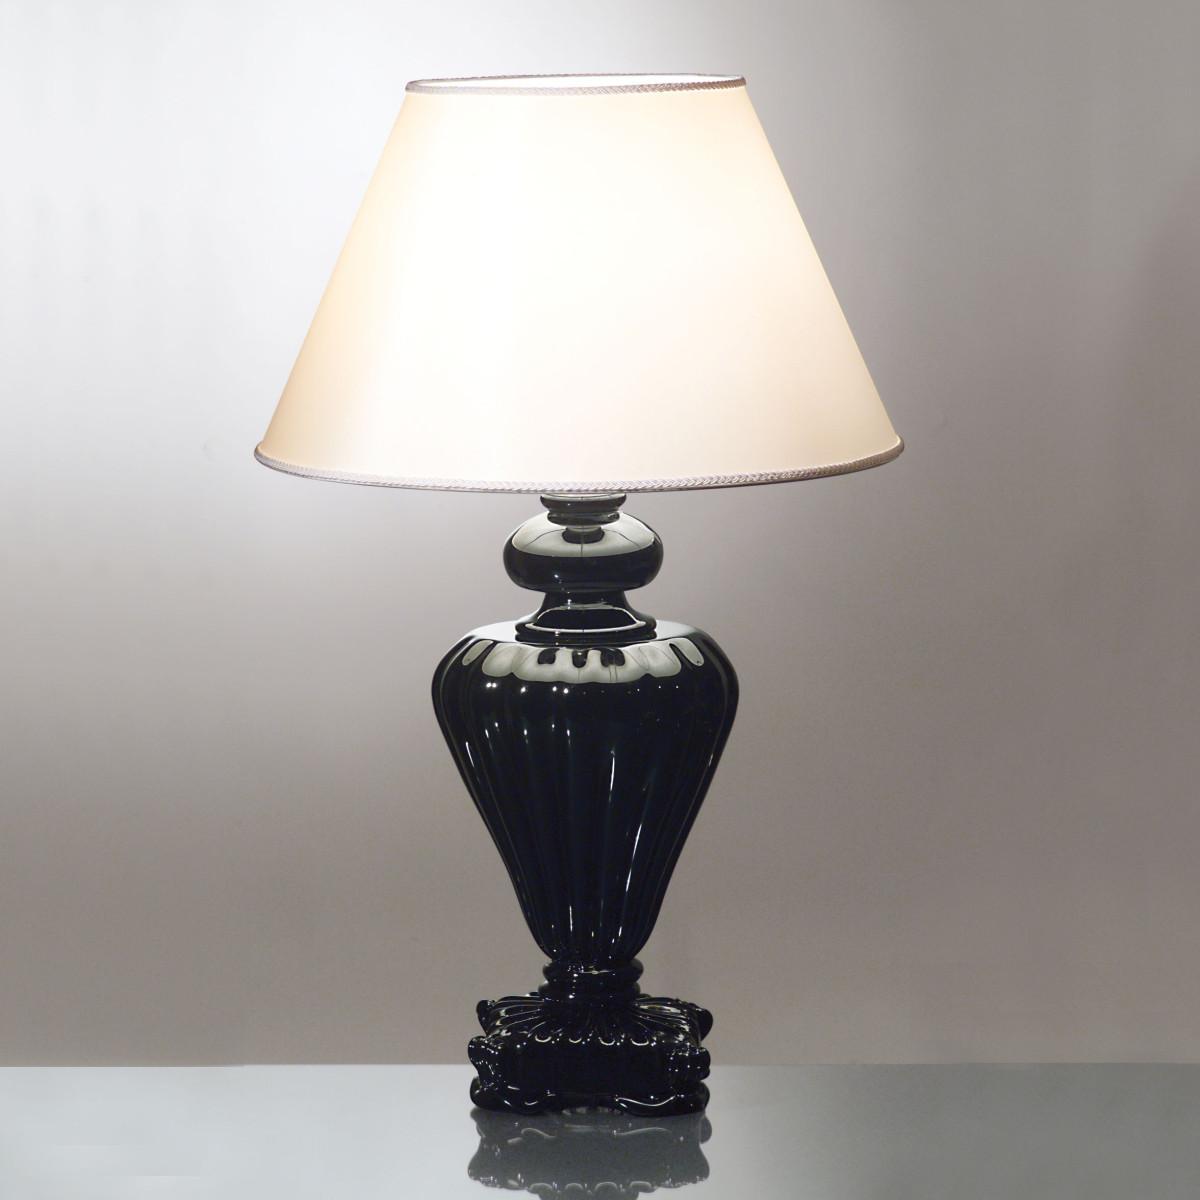 teti lampe de table en verre de murano murano glass. Black Bedroom Furniture Sets. Home Design Ideas